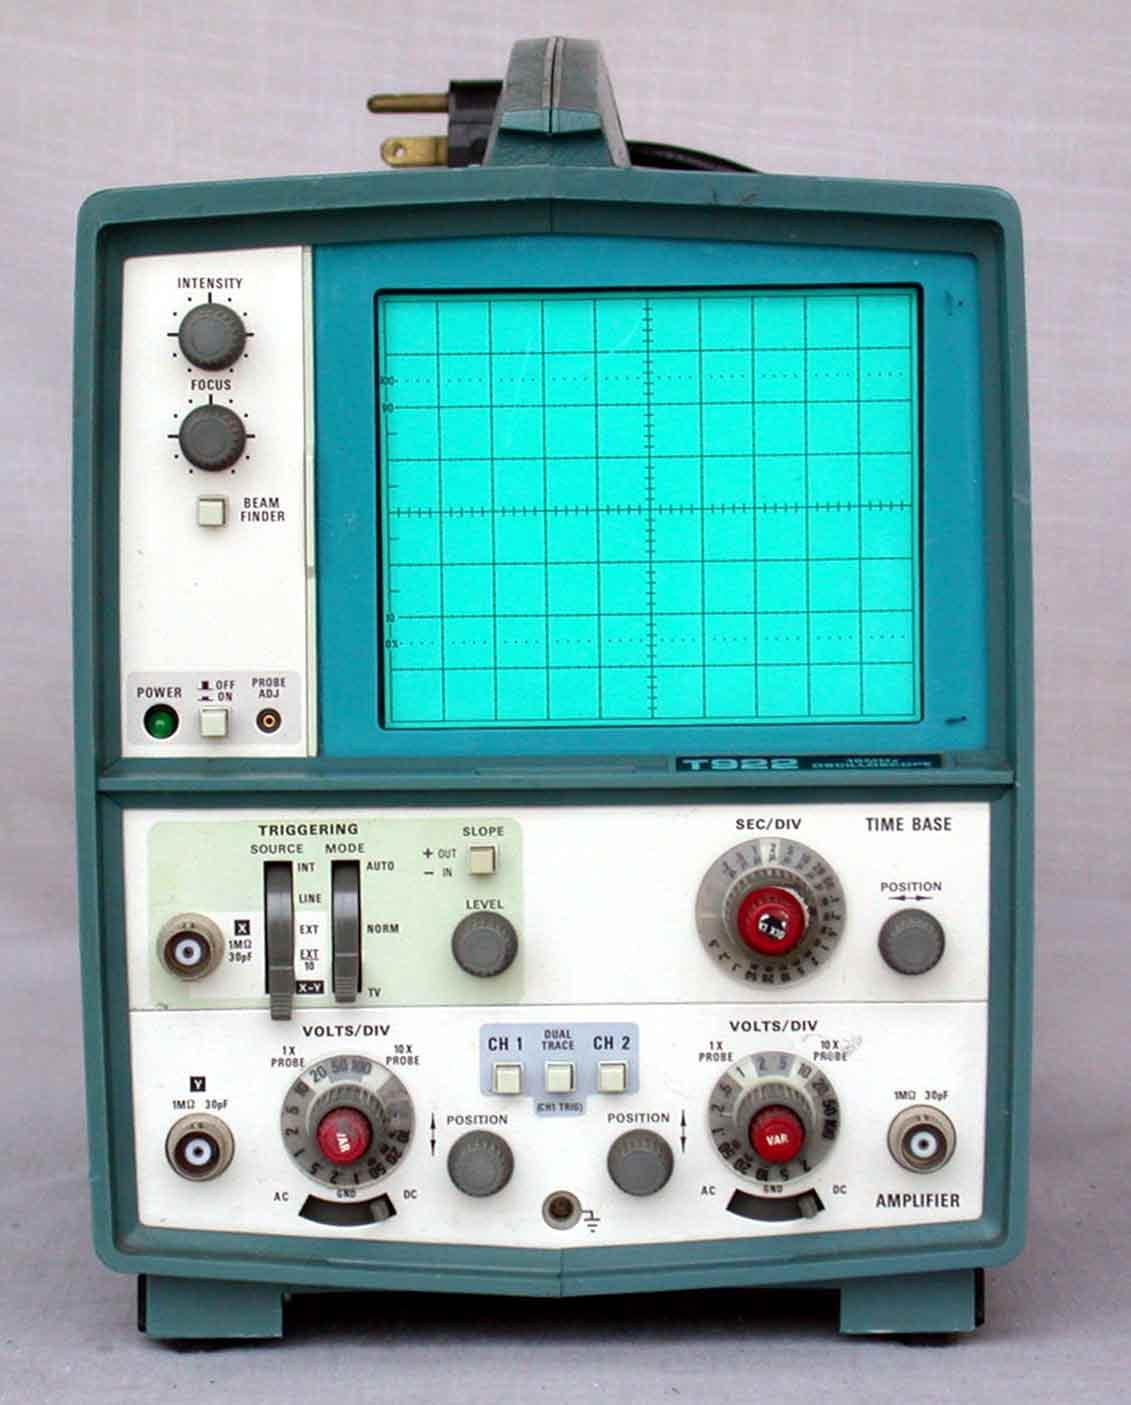 Best Tektronix Oscilloscope : Tektronix t dualtrace oscilloscopes